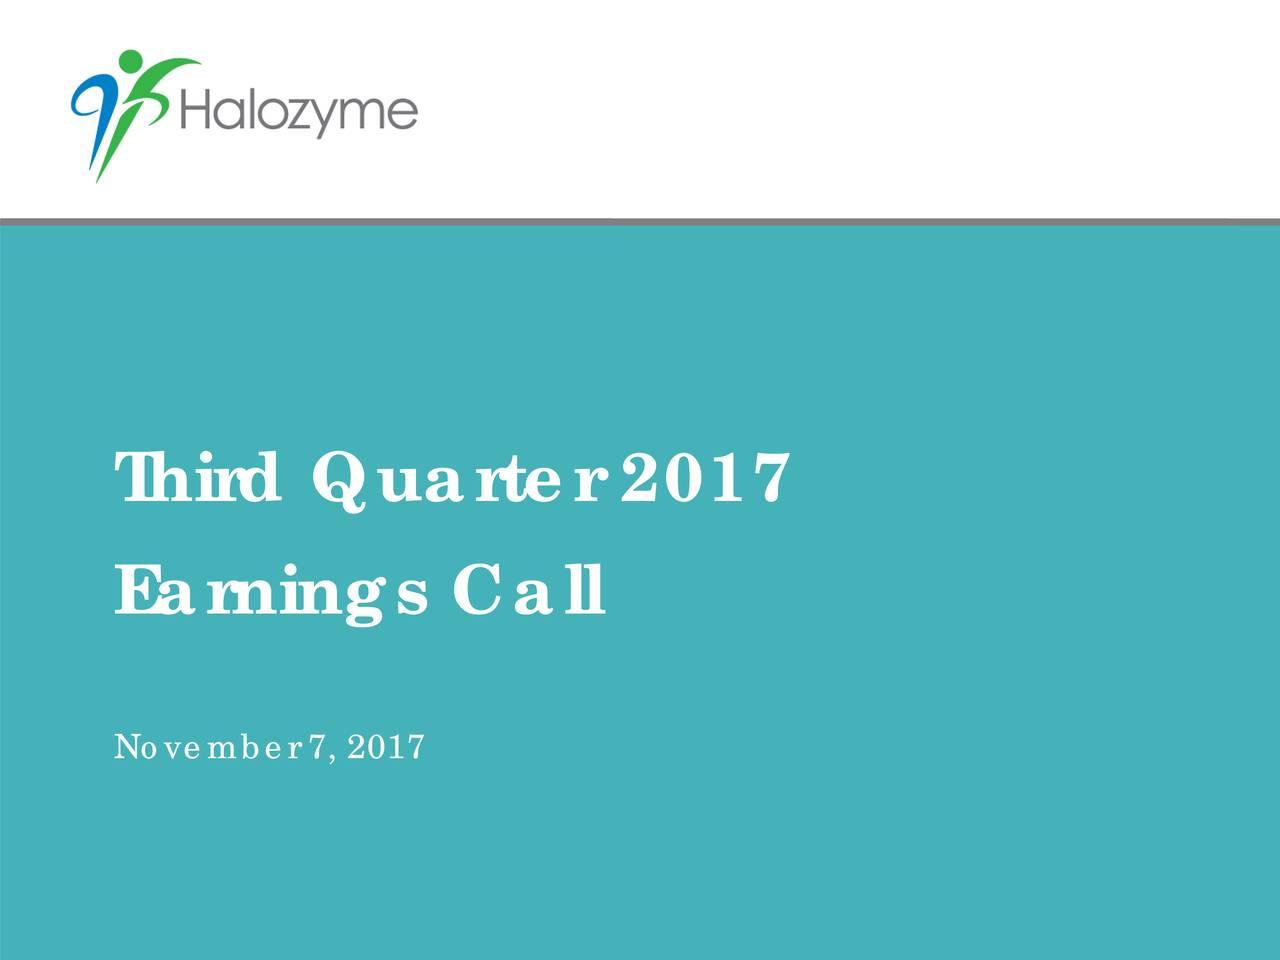 Earnings Call November 7, 2017